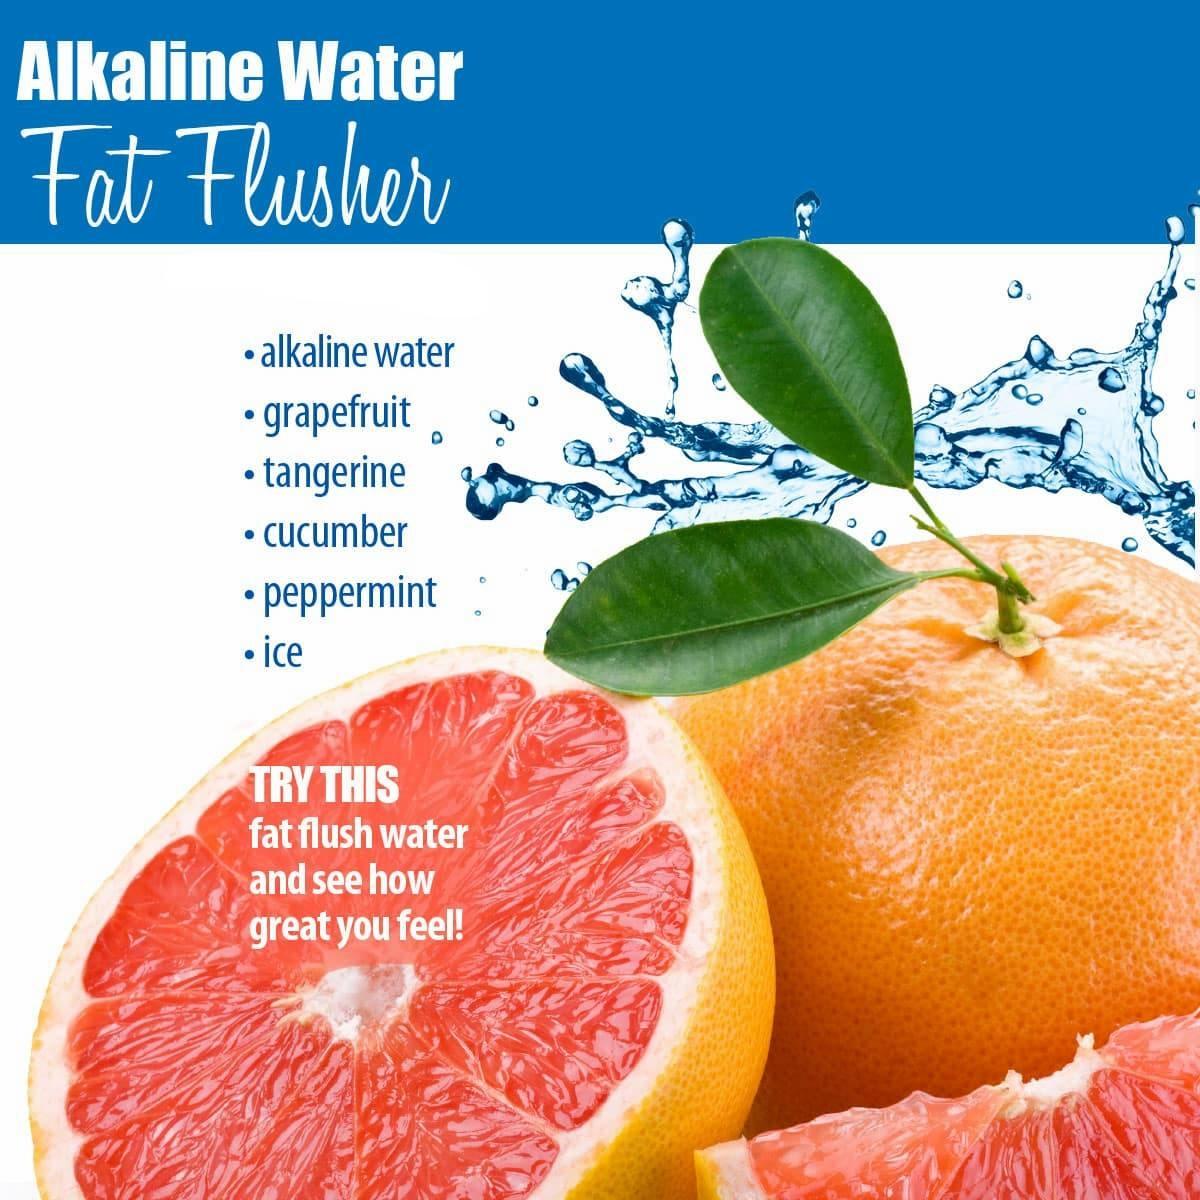 alkaline-water-fat-flusher.jpg